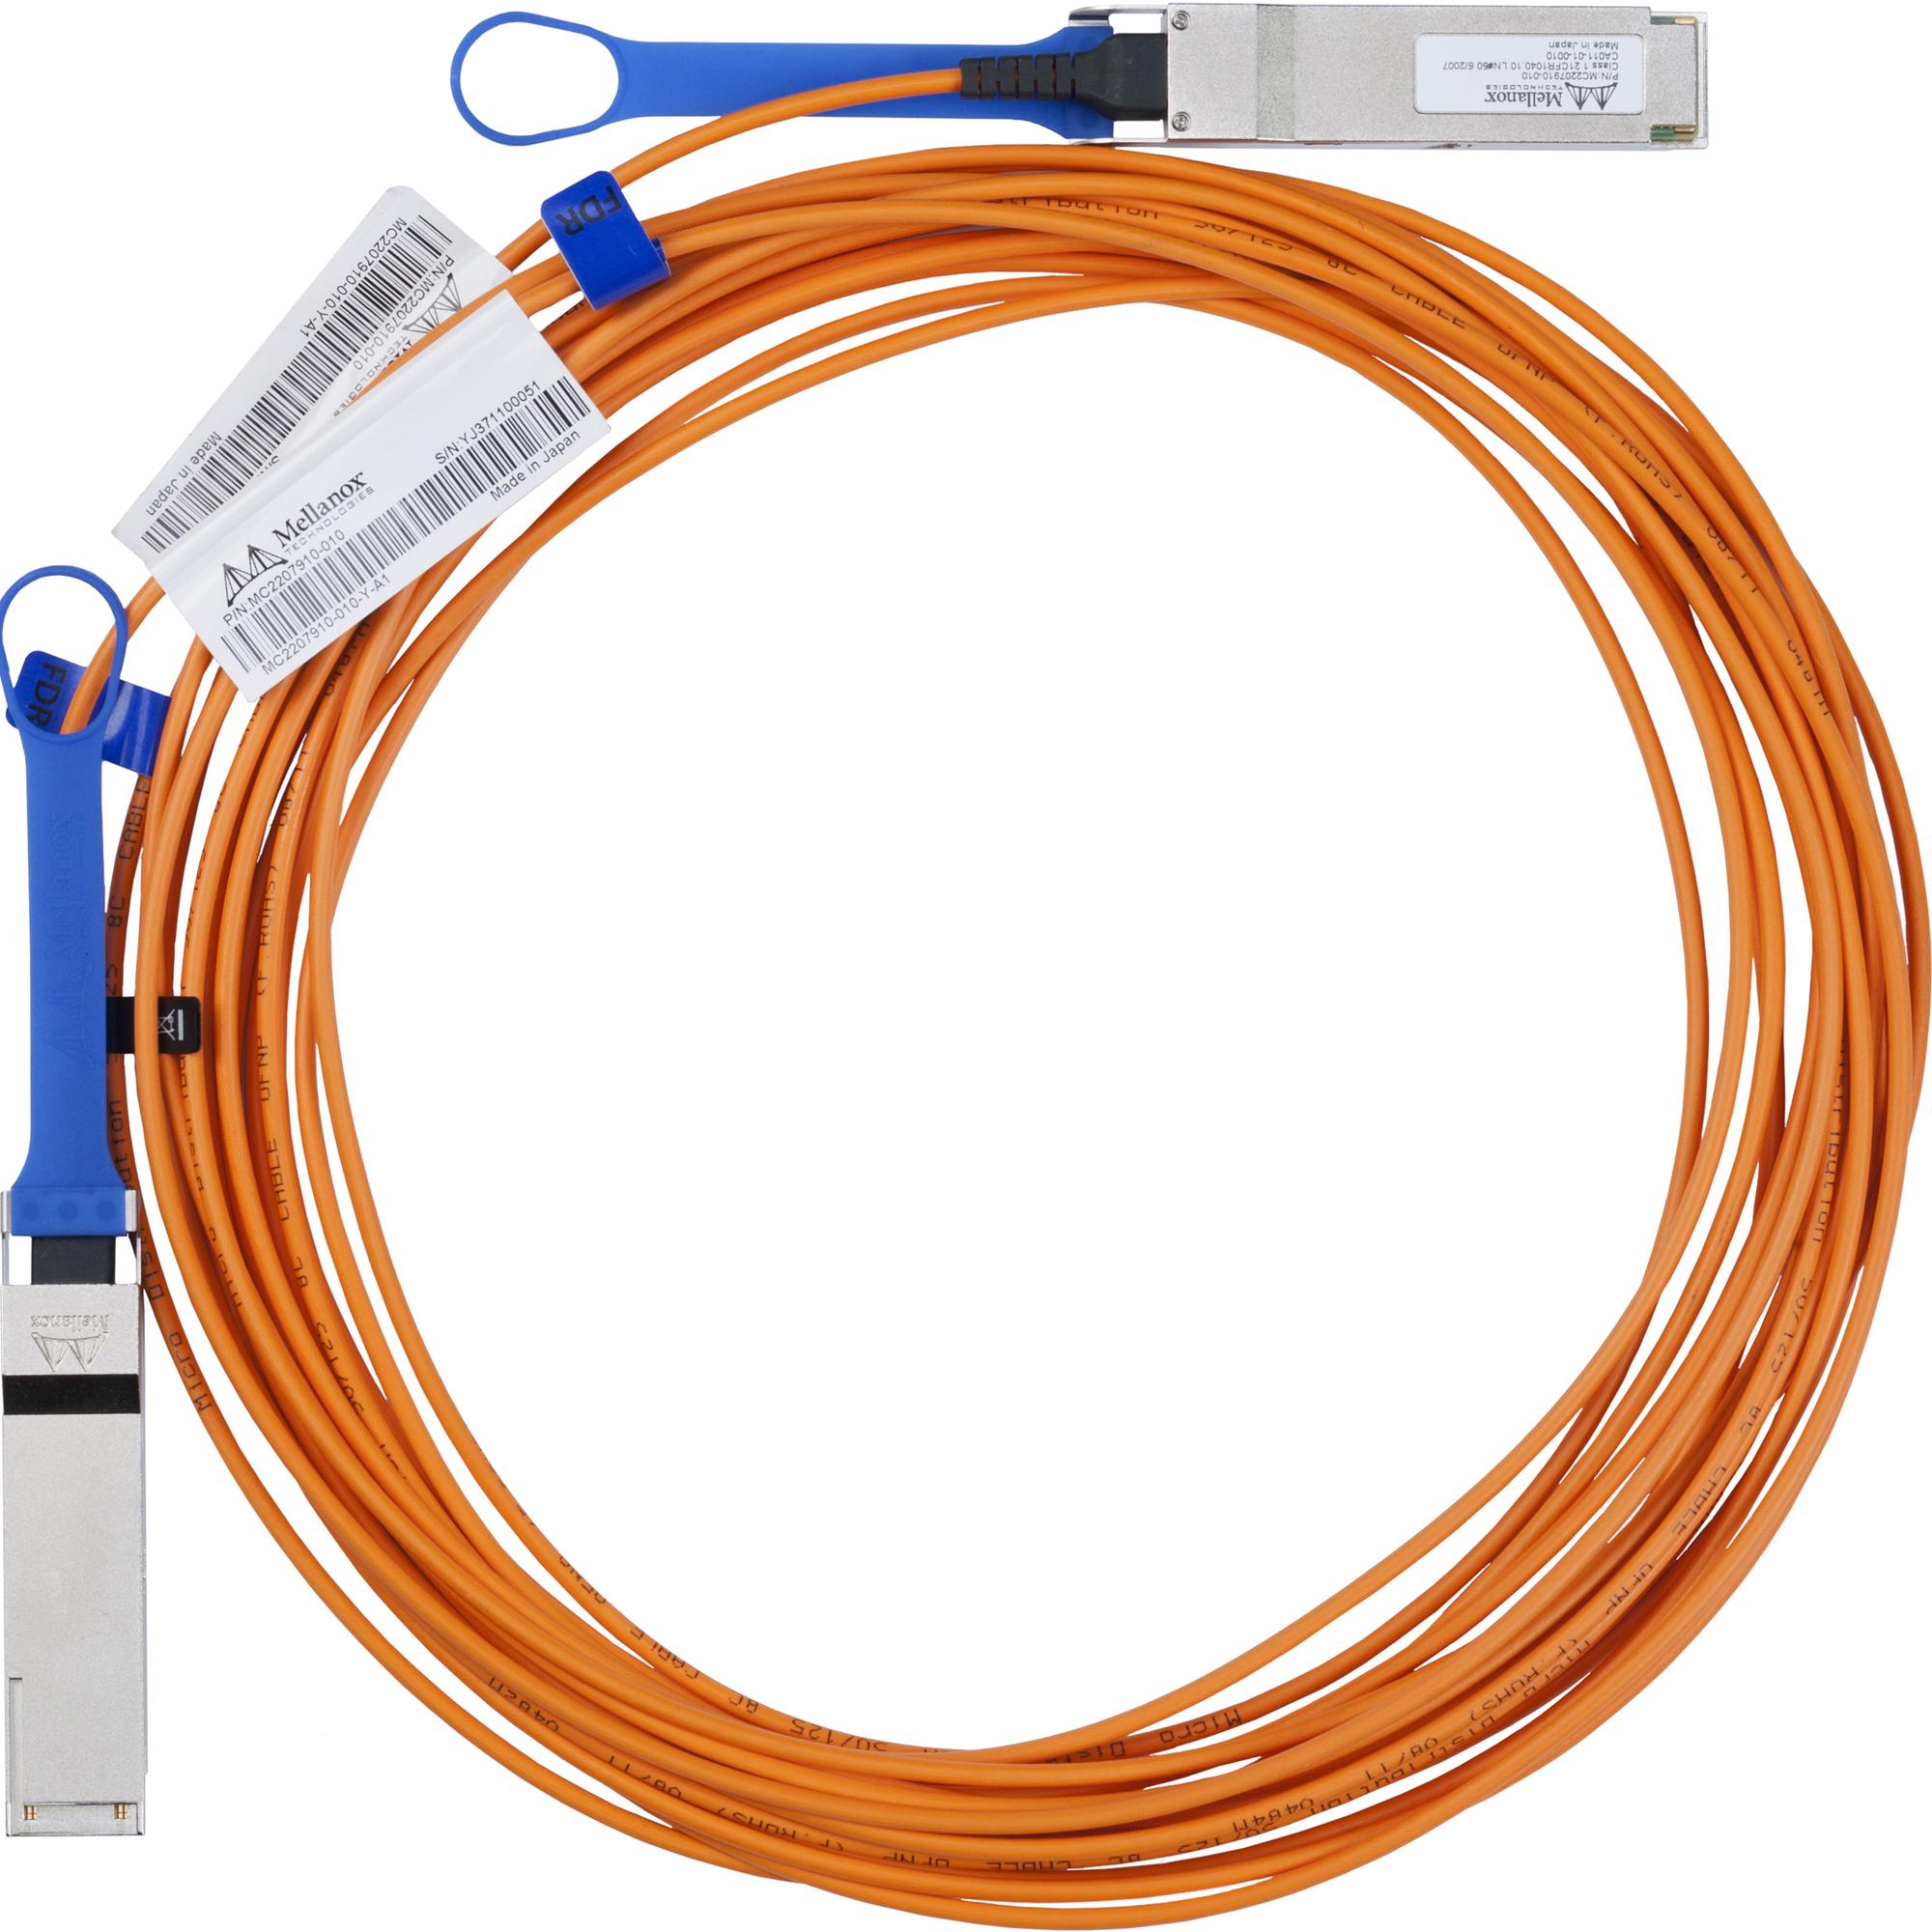 Mellanox Fibre Optic Network Cable for Network Device - 5 m - 1 x QSFP Male Network - 1 x QSFP Male Network